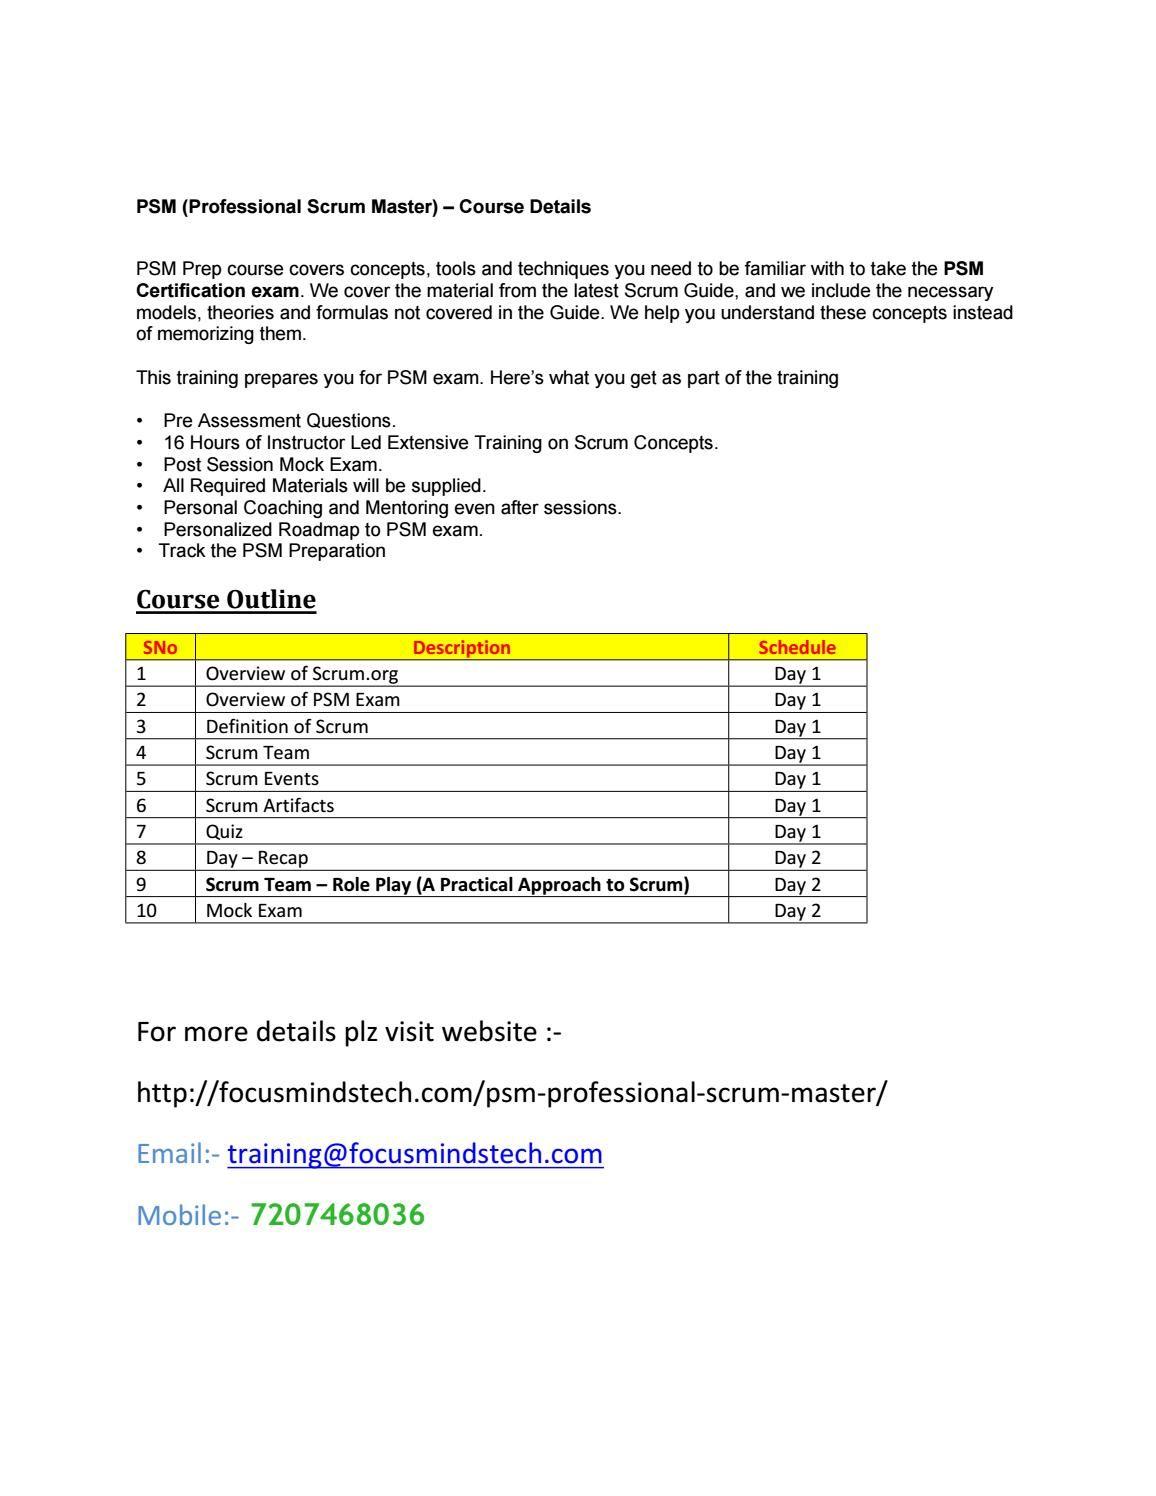 Scrum master psm certification training in hyderabad professional scrum master psm certification training in hyderabad 1betcityfo Images